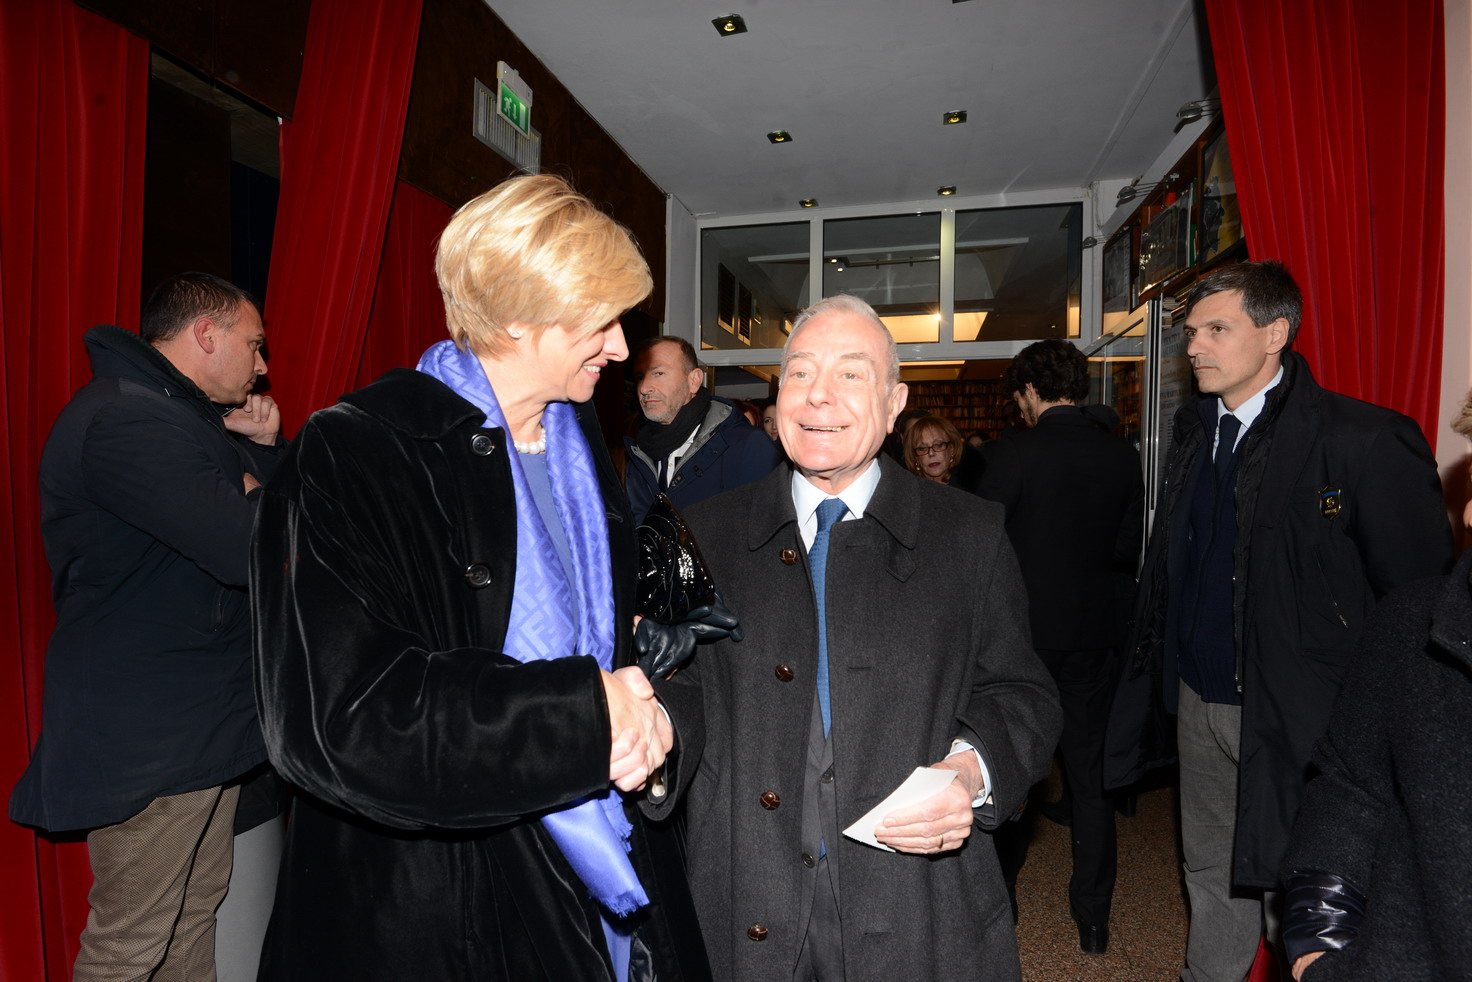 Roberta Pinotti e Gianni Letta